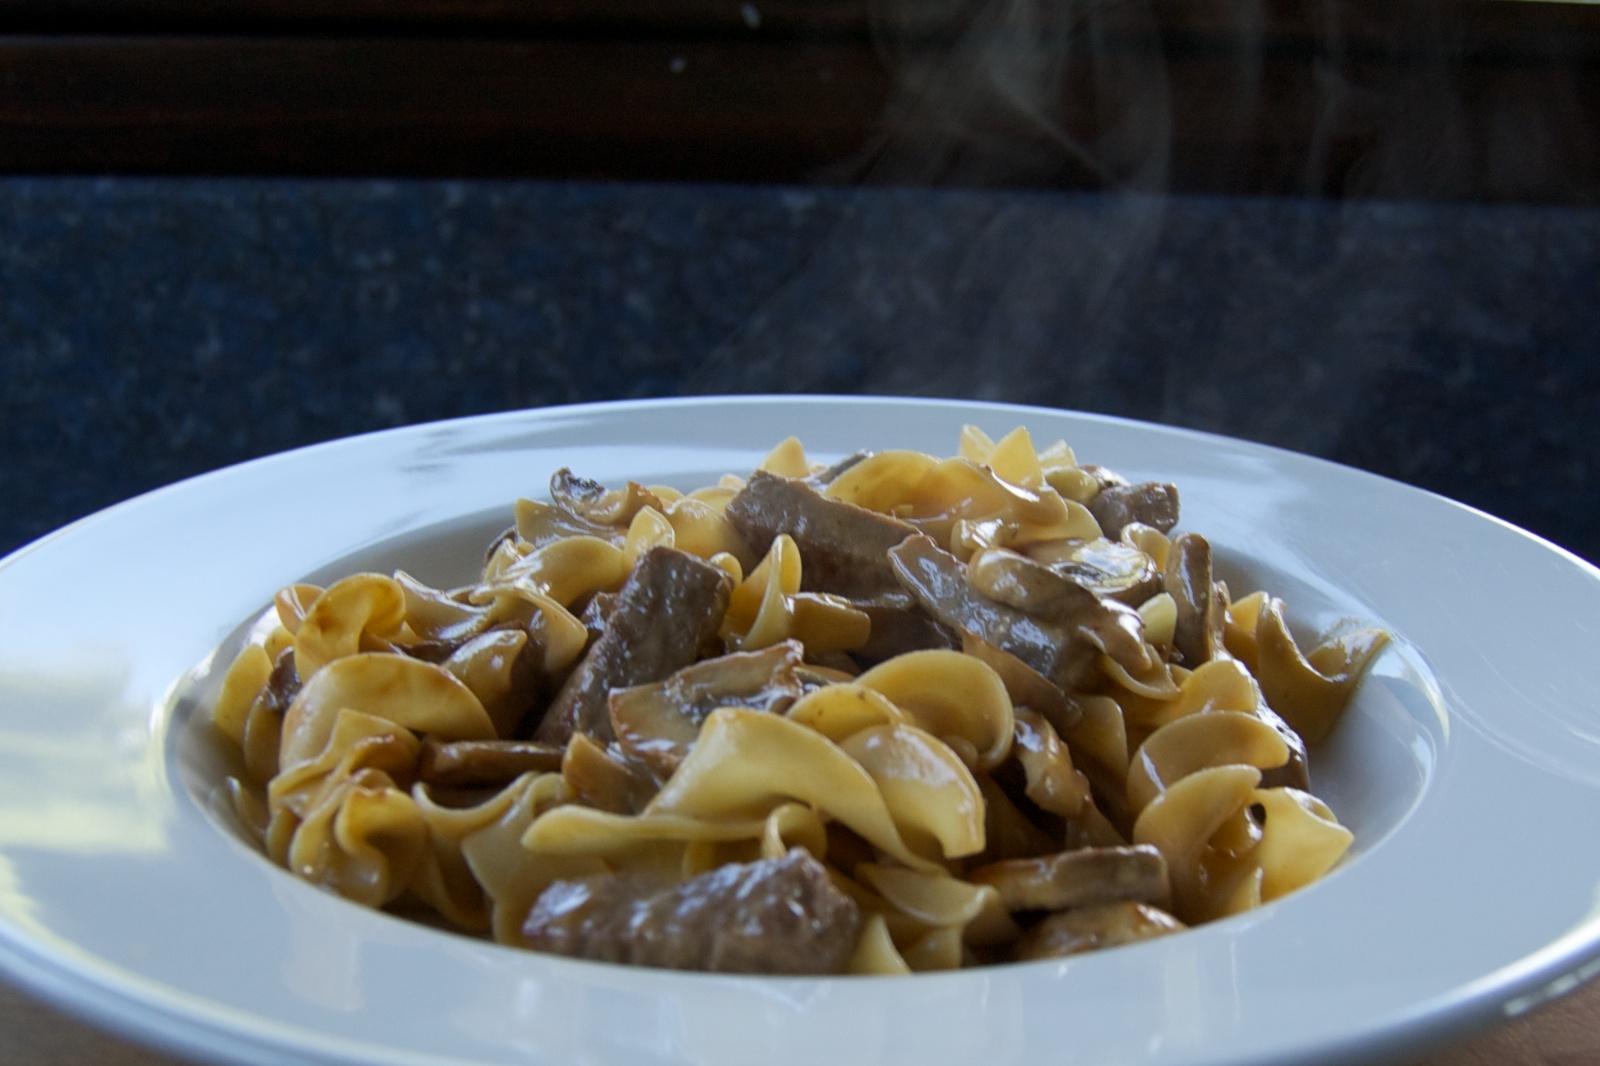 http://blog.rickk.com/food/2012/08/24/ate.2012.08.23.d.jpg